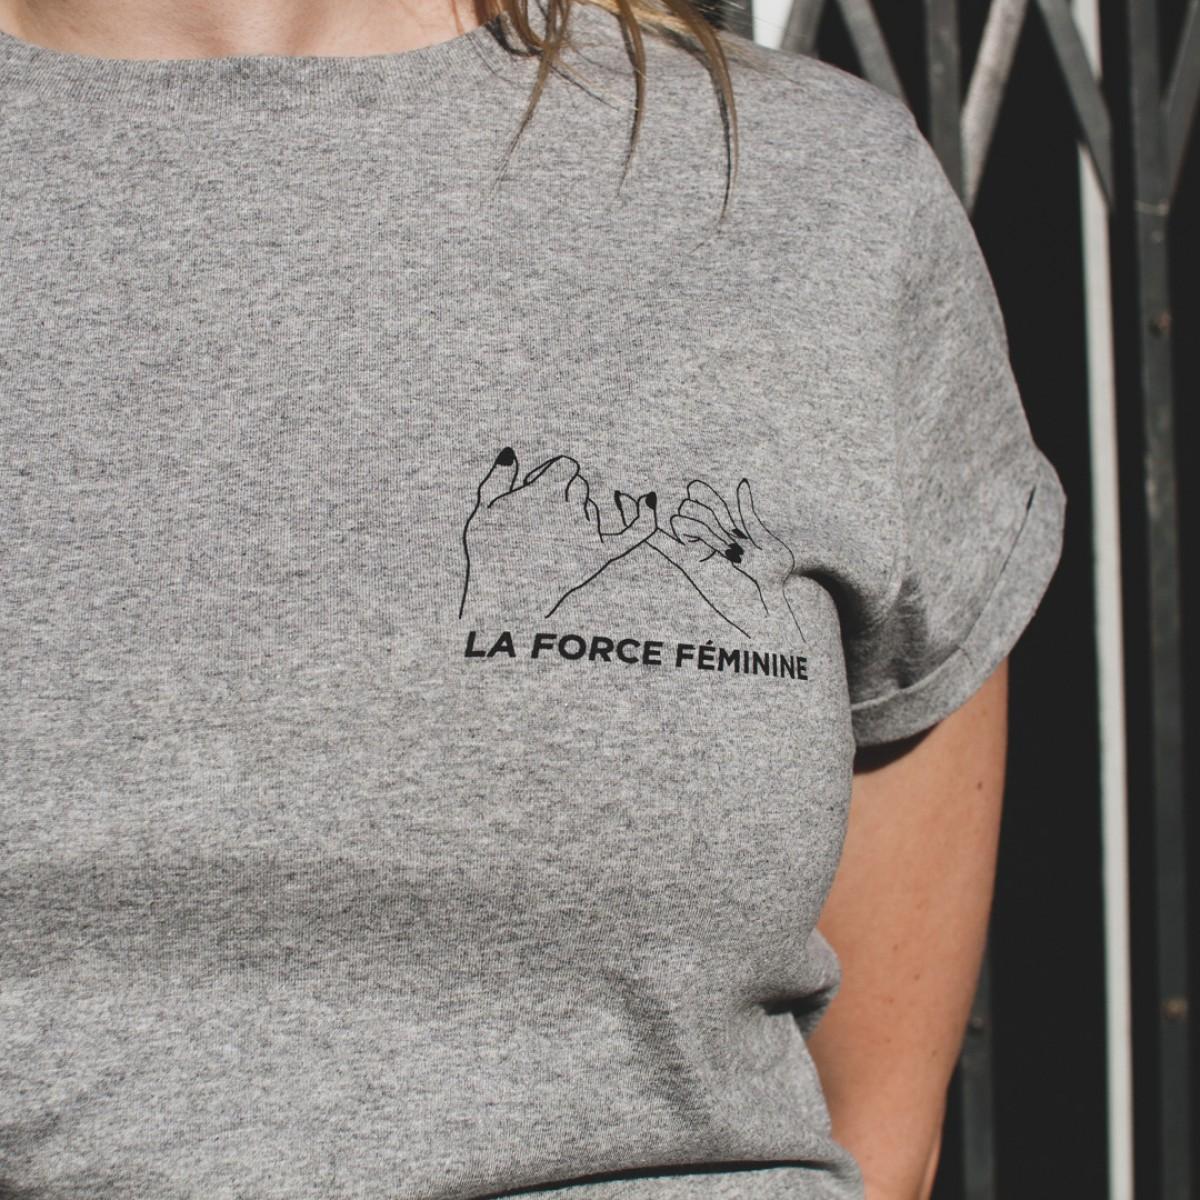 ÄSTHETIKA T-Shirt Roll Up - LA FORCE FÉMININE